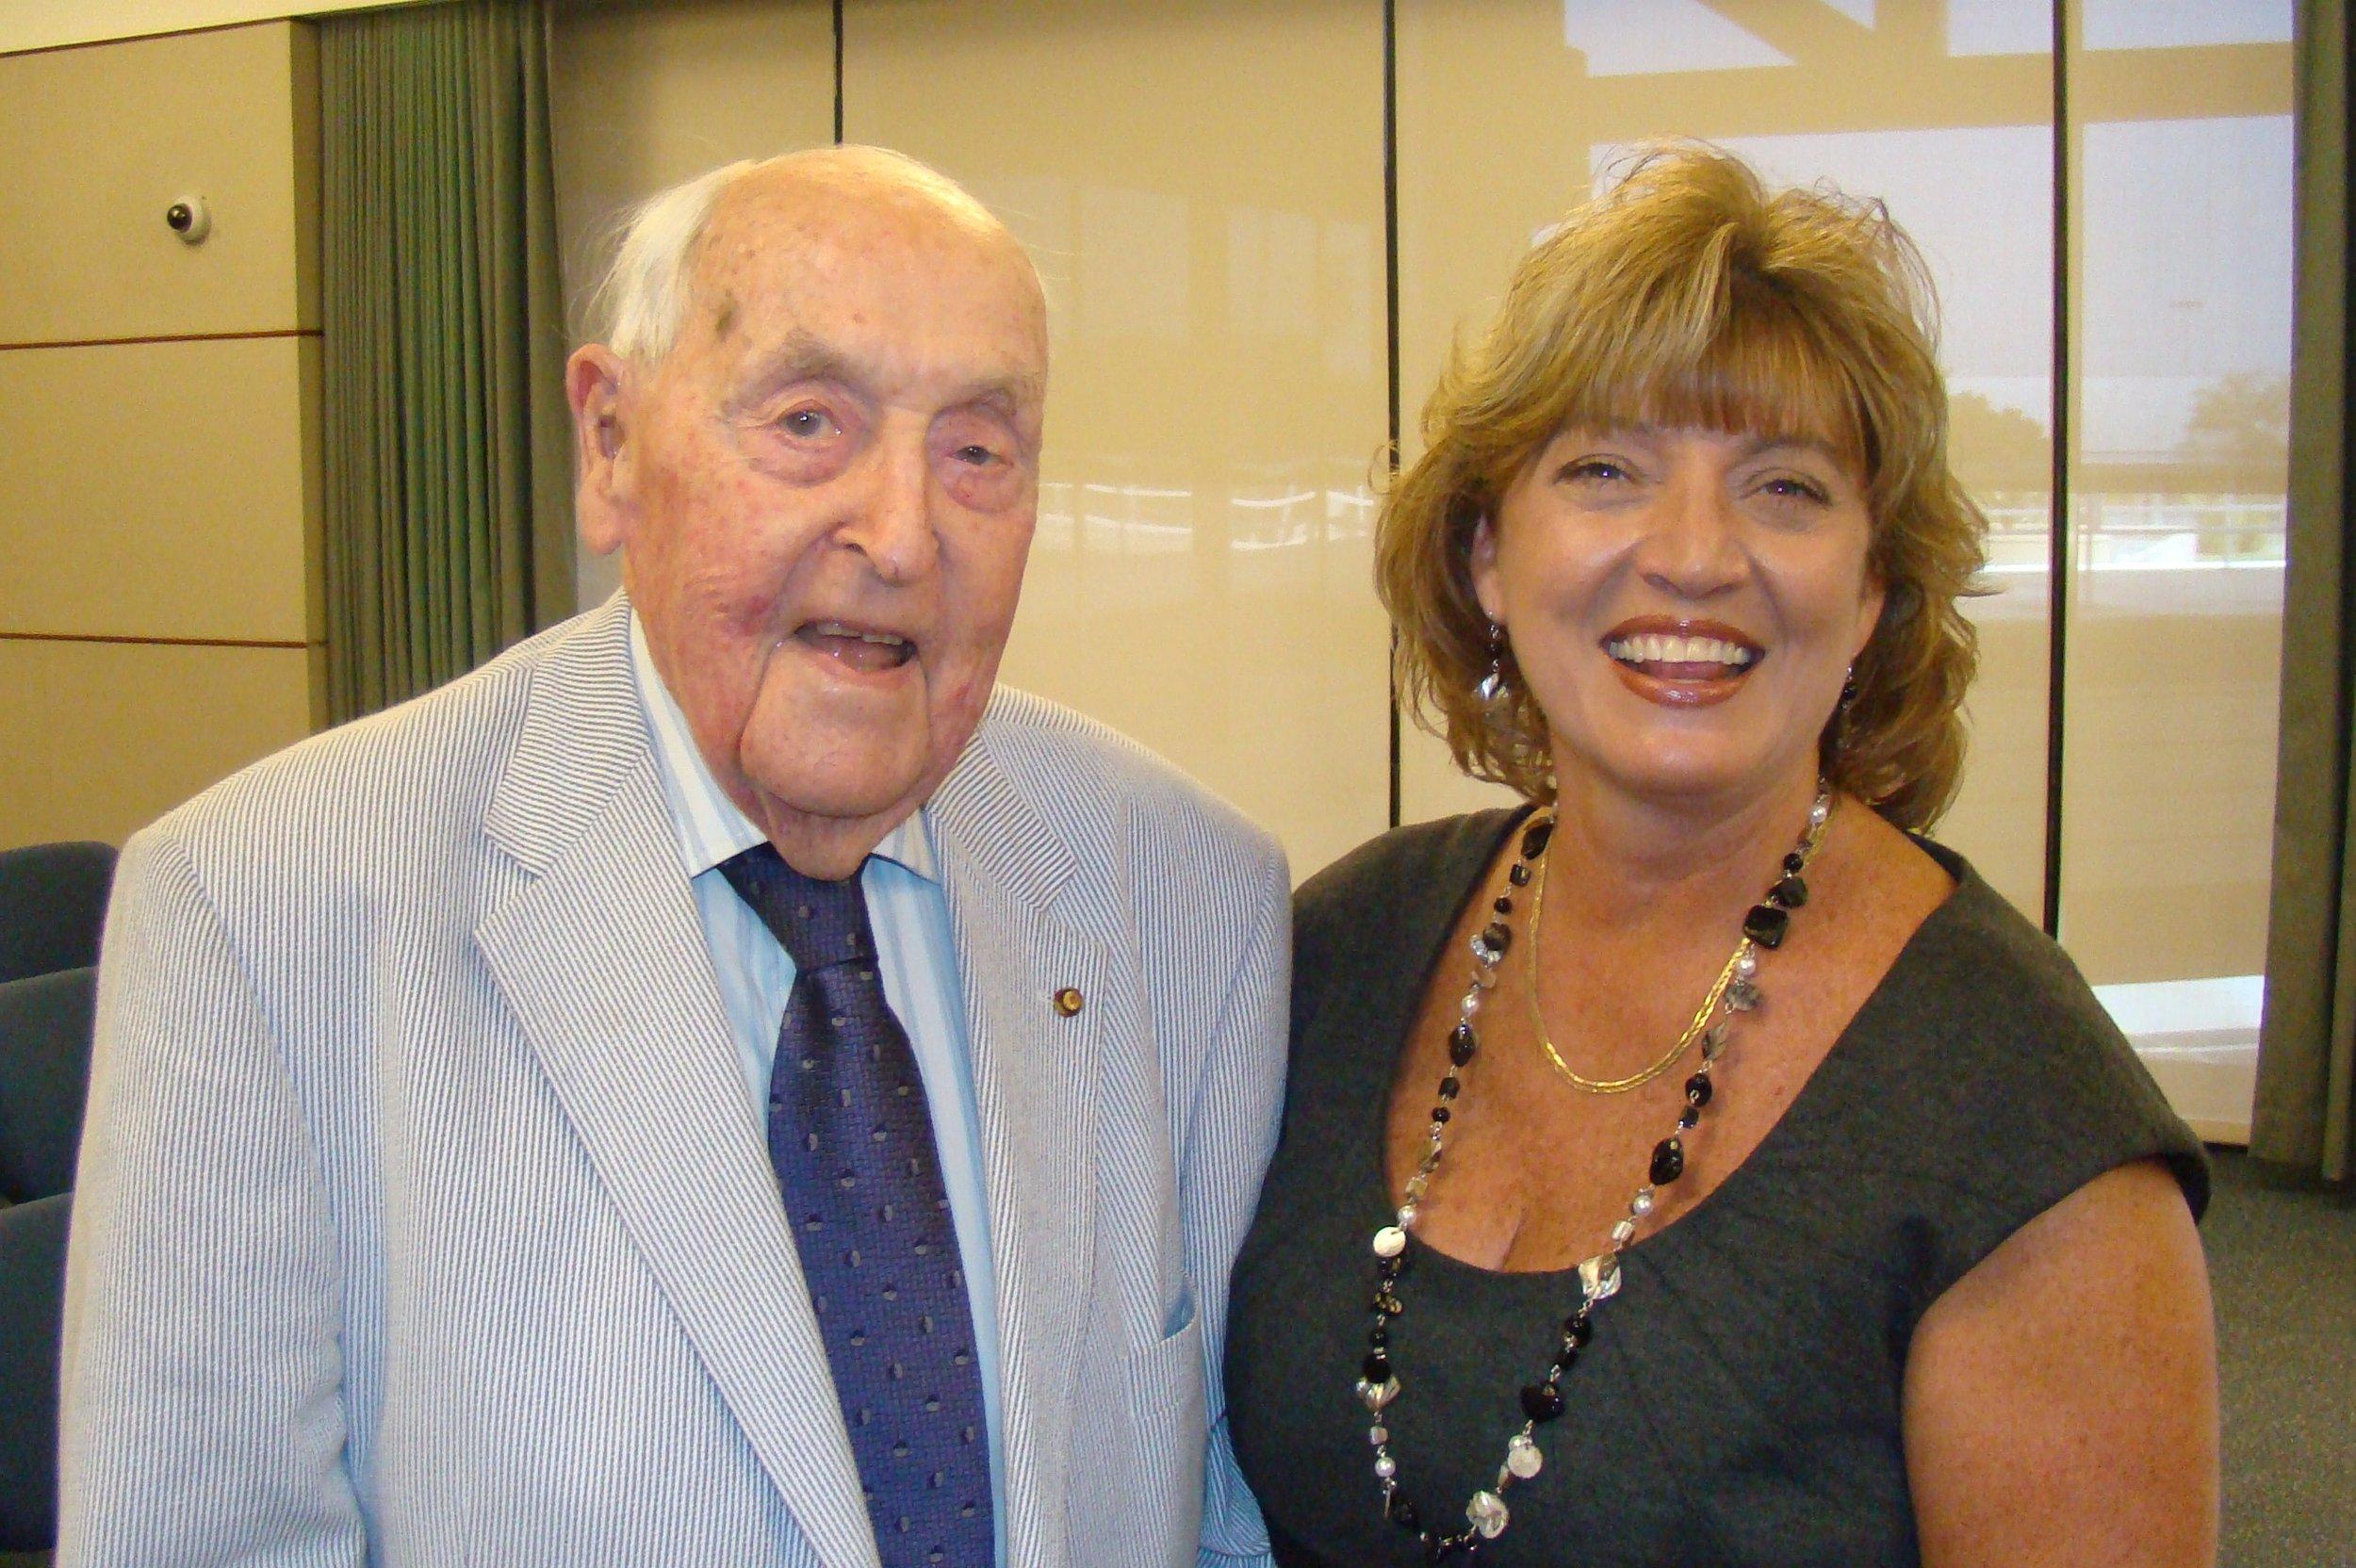 Sir Lenox & Colleen Picard - 2, 27 Oct '11.JPG